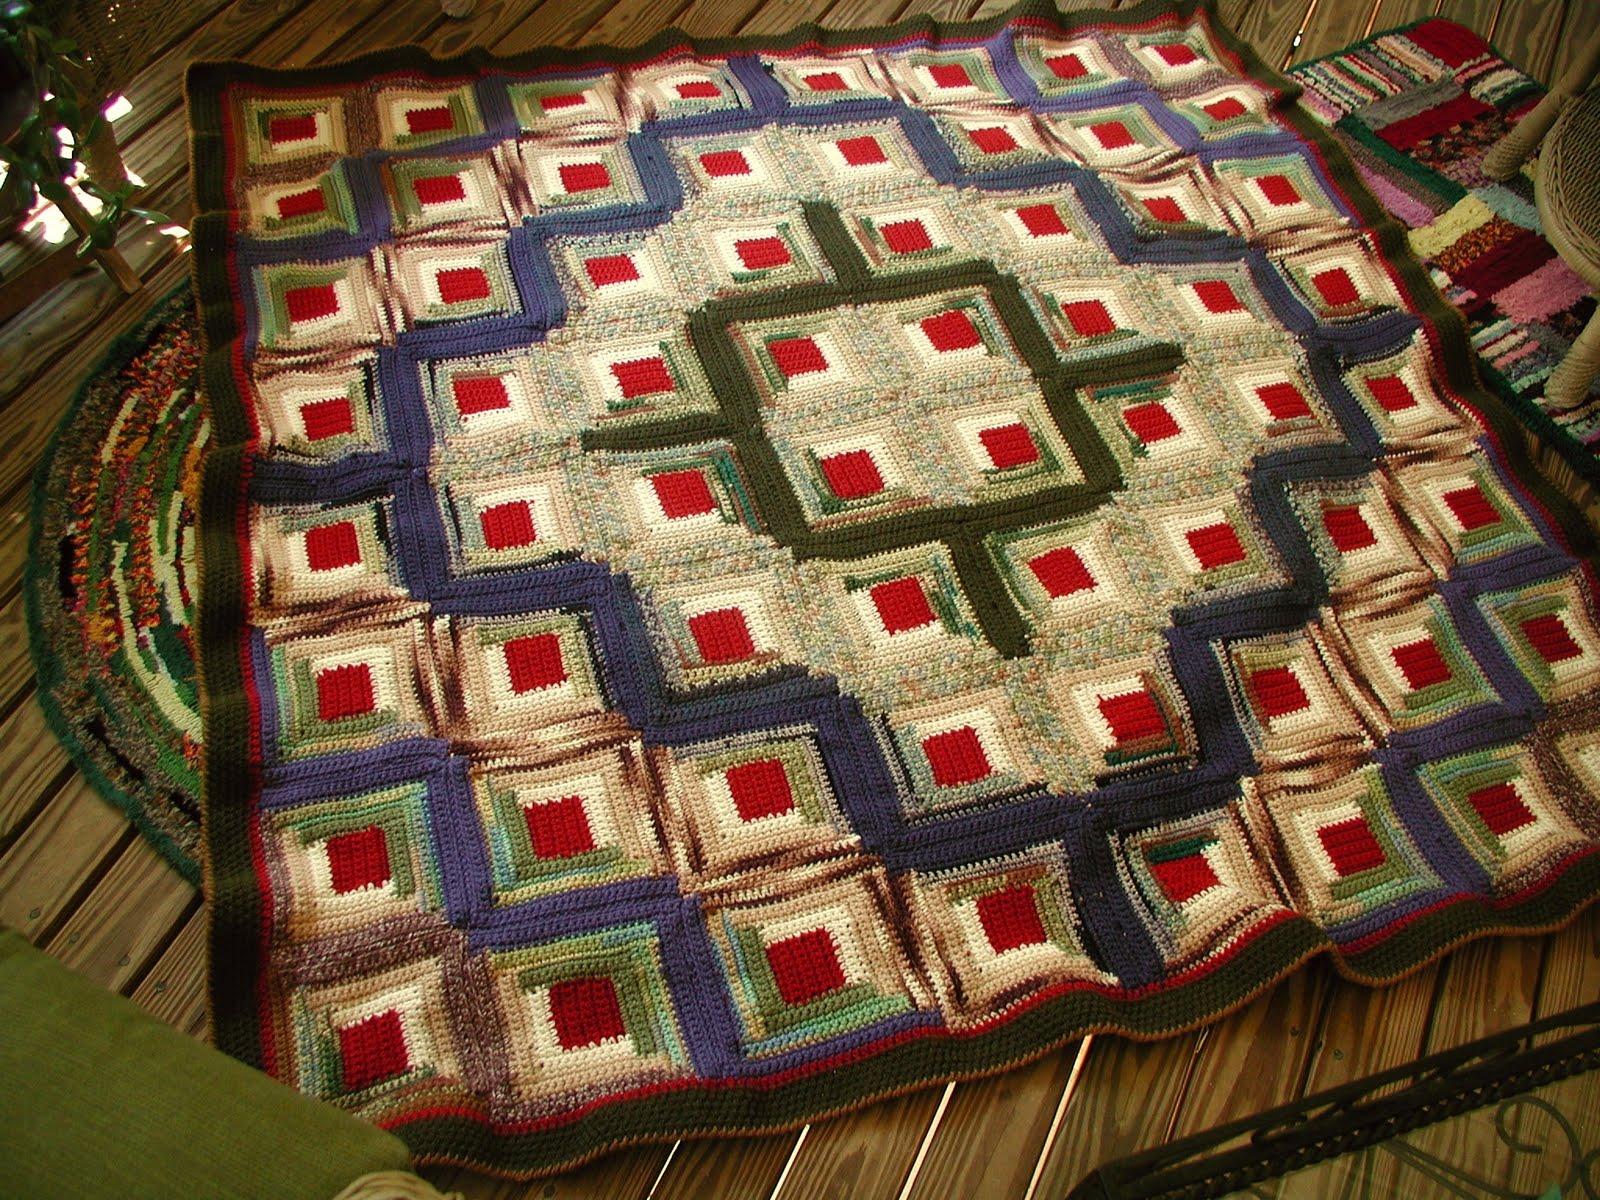 Fiddlesticks - My crochet and knitting ramblings.: Tah - Dah ...